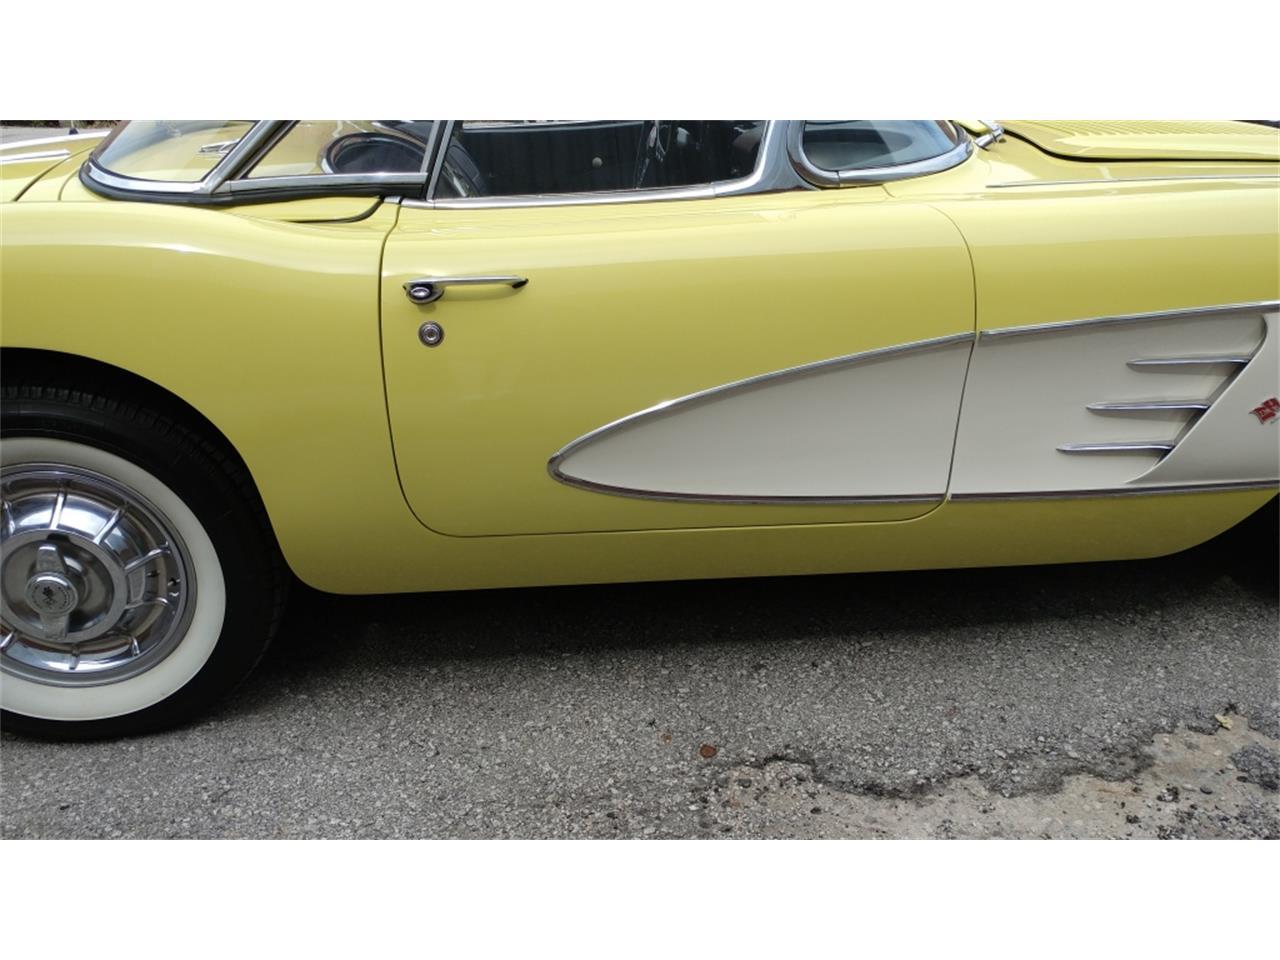 Large Picture of 1958 Corvette located in Missouri - $75,999.00 - MO26